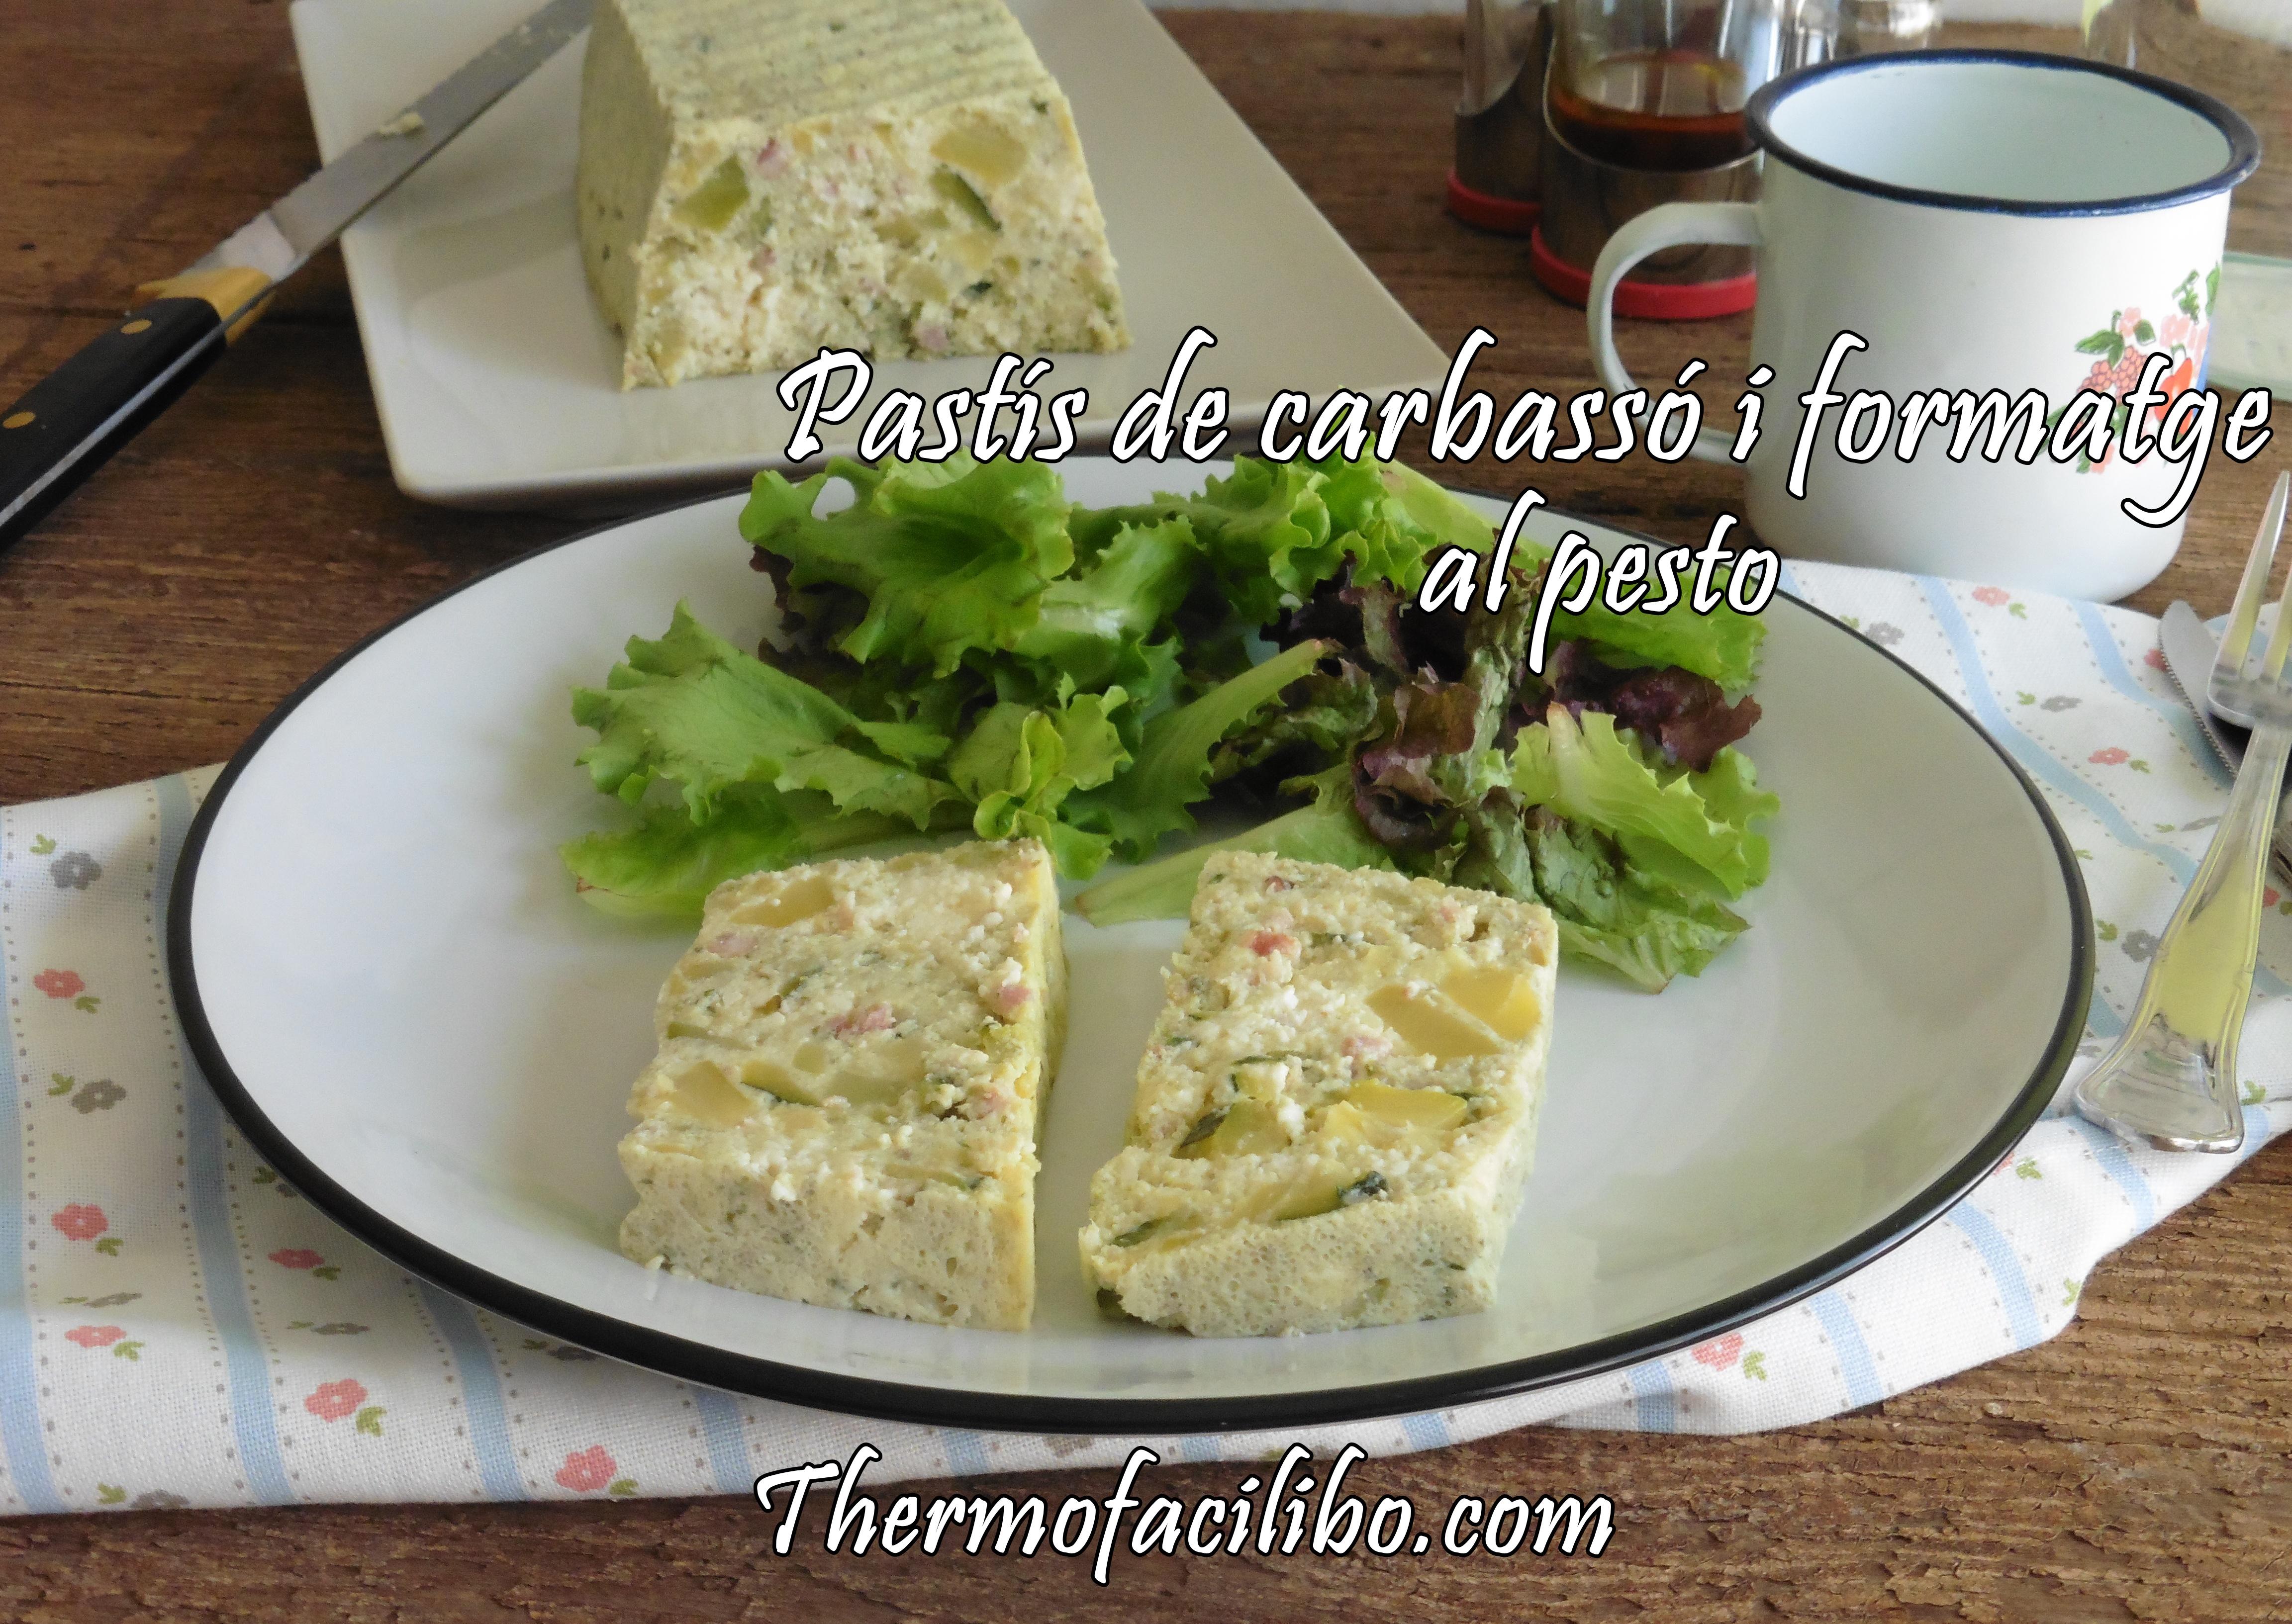 Pastís de carbassó i formatge al pesto